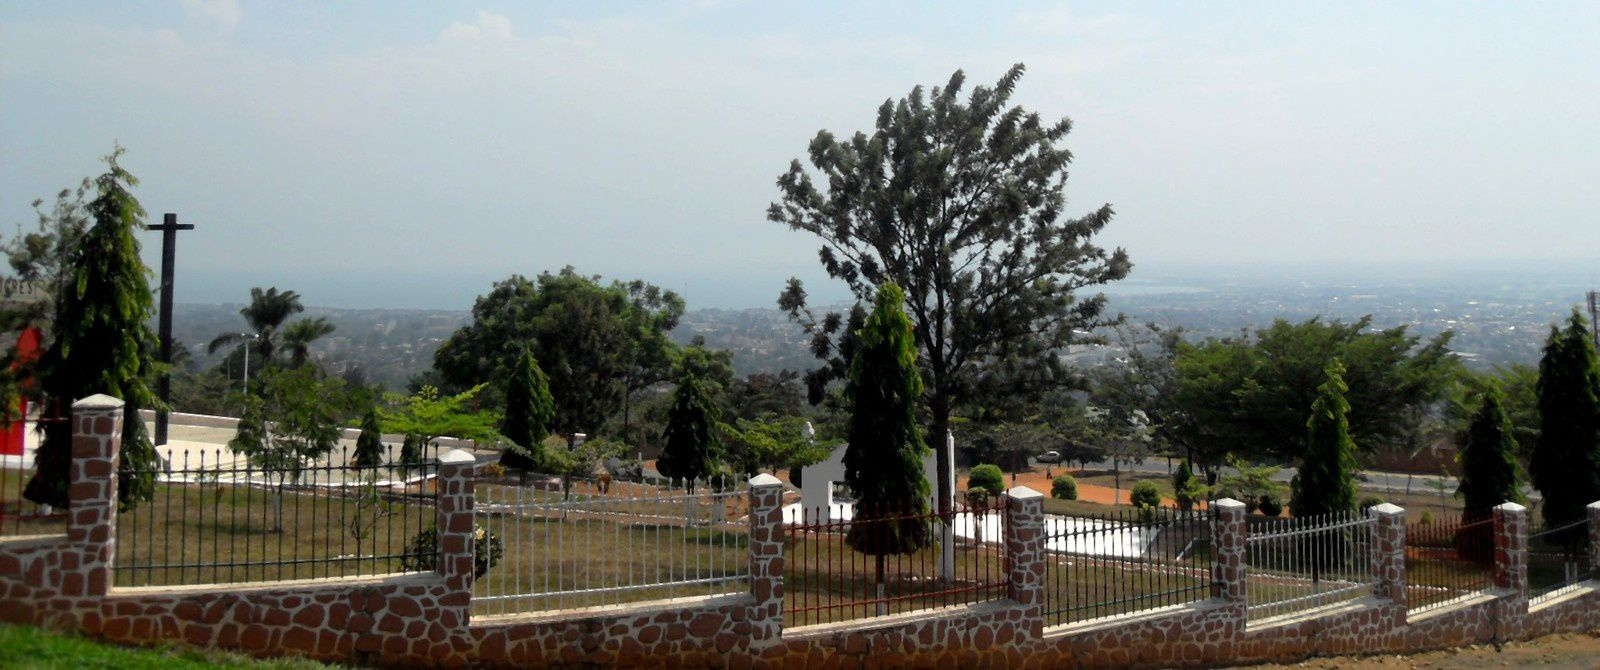 Bujumbura : le lac Tanganyika et ses hippopotames